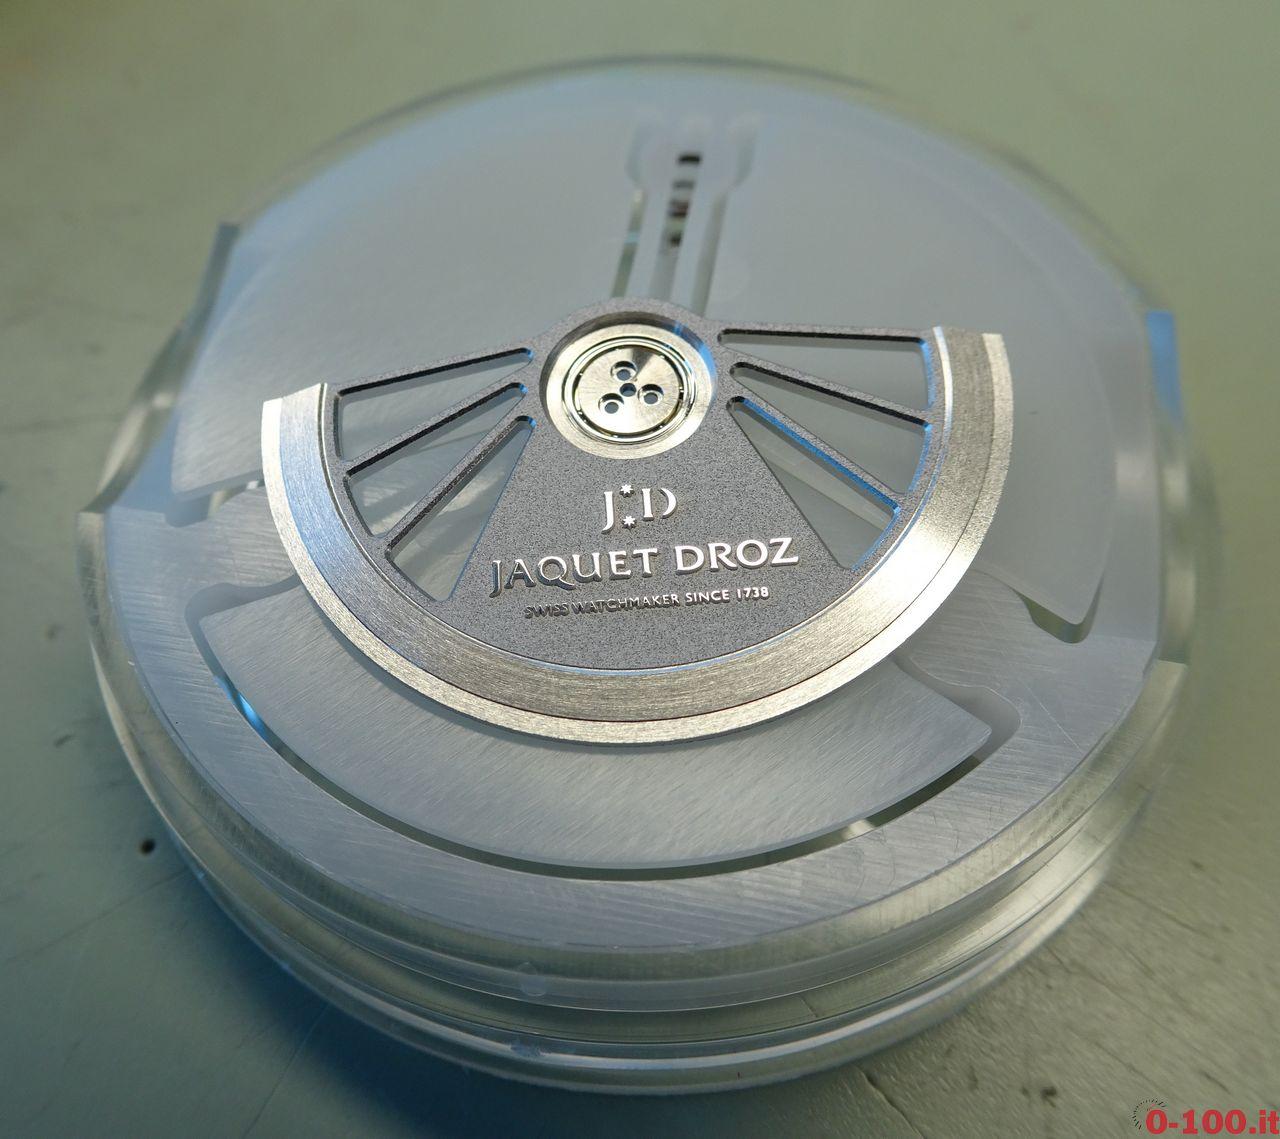 gli-speciali-di-0-100-it-jaquet-droz-la-manifattura-di-la-chaux-de-fonds_0-10056